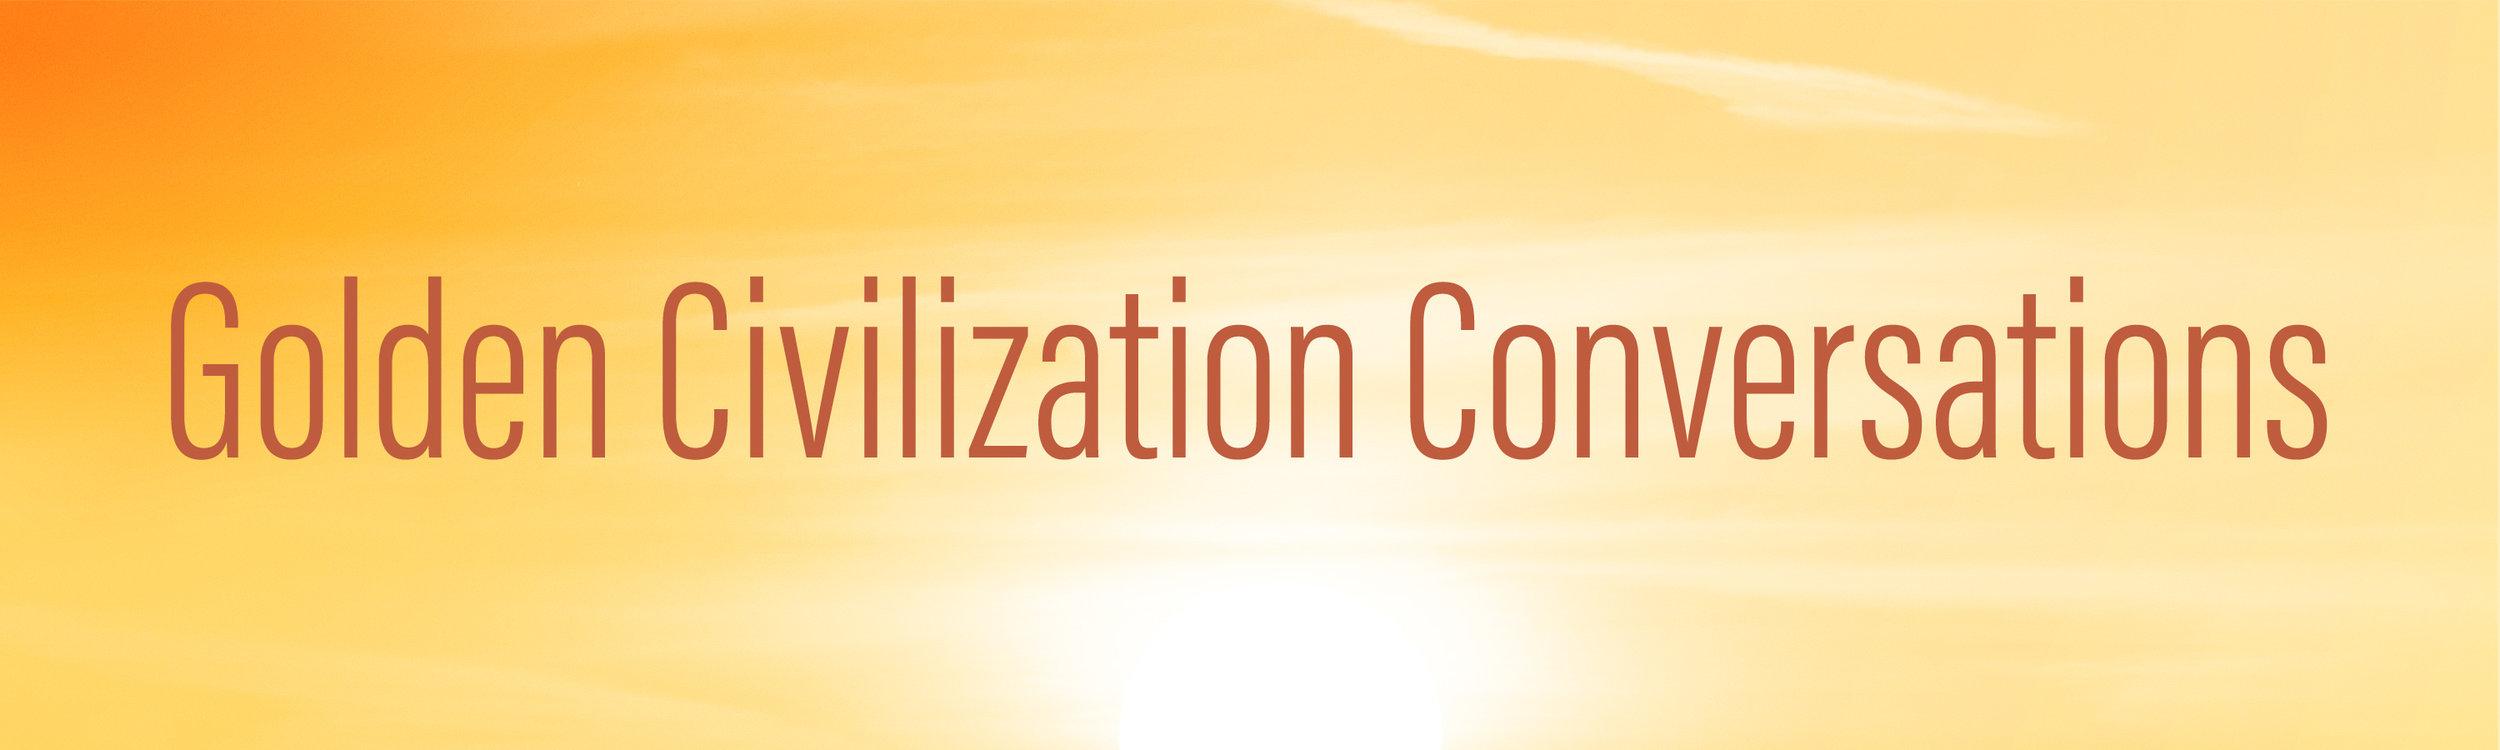 Golden Civilization Conversations